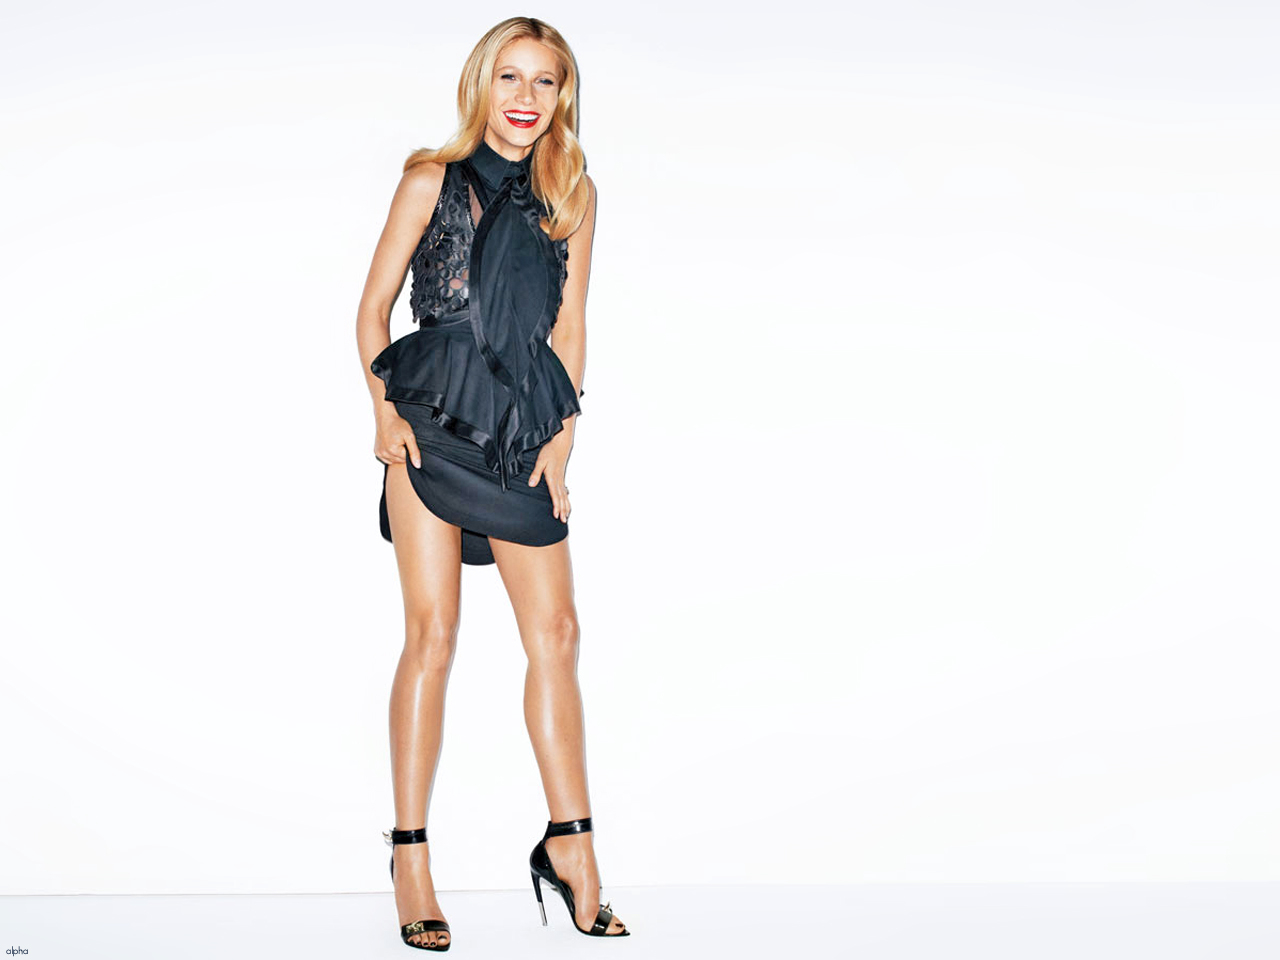 http://4.bp.blogspot.com/-4h3h2tgPW0I/Tyvhz1JXILI/AAAAAAAAJOI/lf5HYUZ14Y0/s1600/sploogeblog_gwyneth_paltrow_leggy_minidress_ballgown_wallpaper_06.jpg